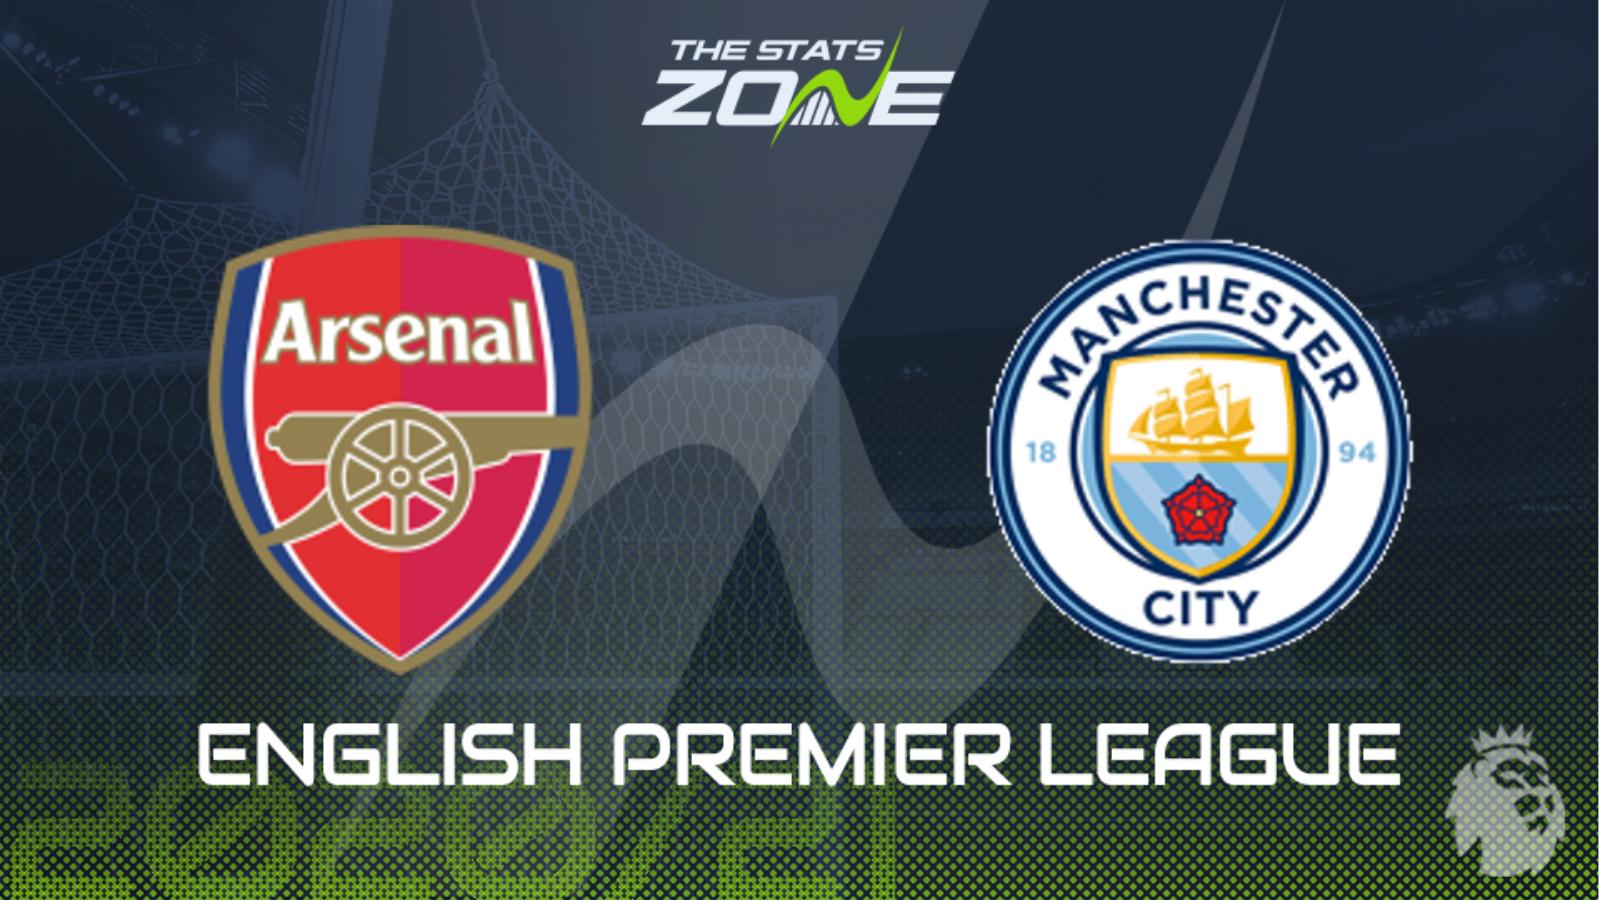 2020 21 Premier League Arsenal Vs Man City Preview Prediction The Stats Zone